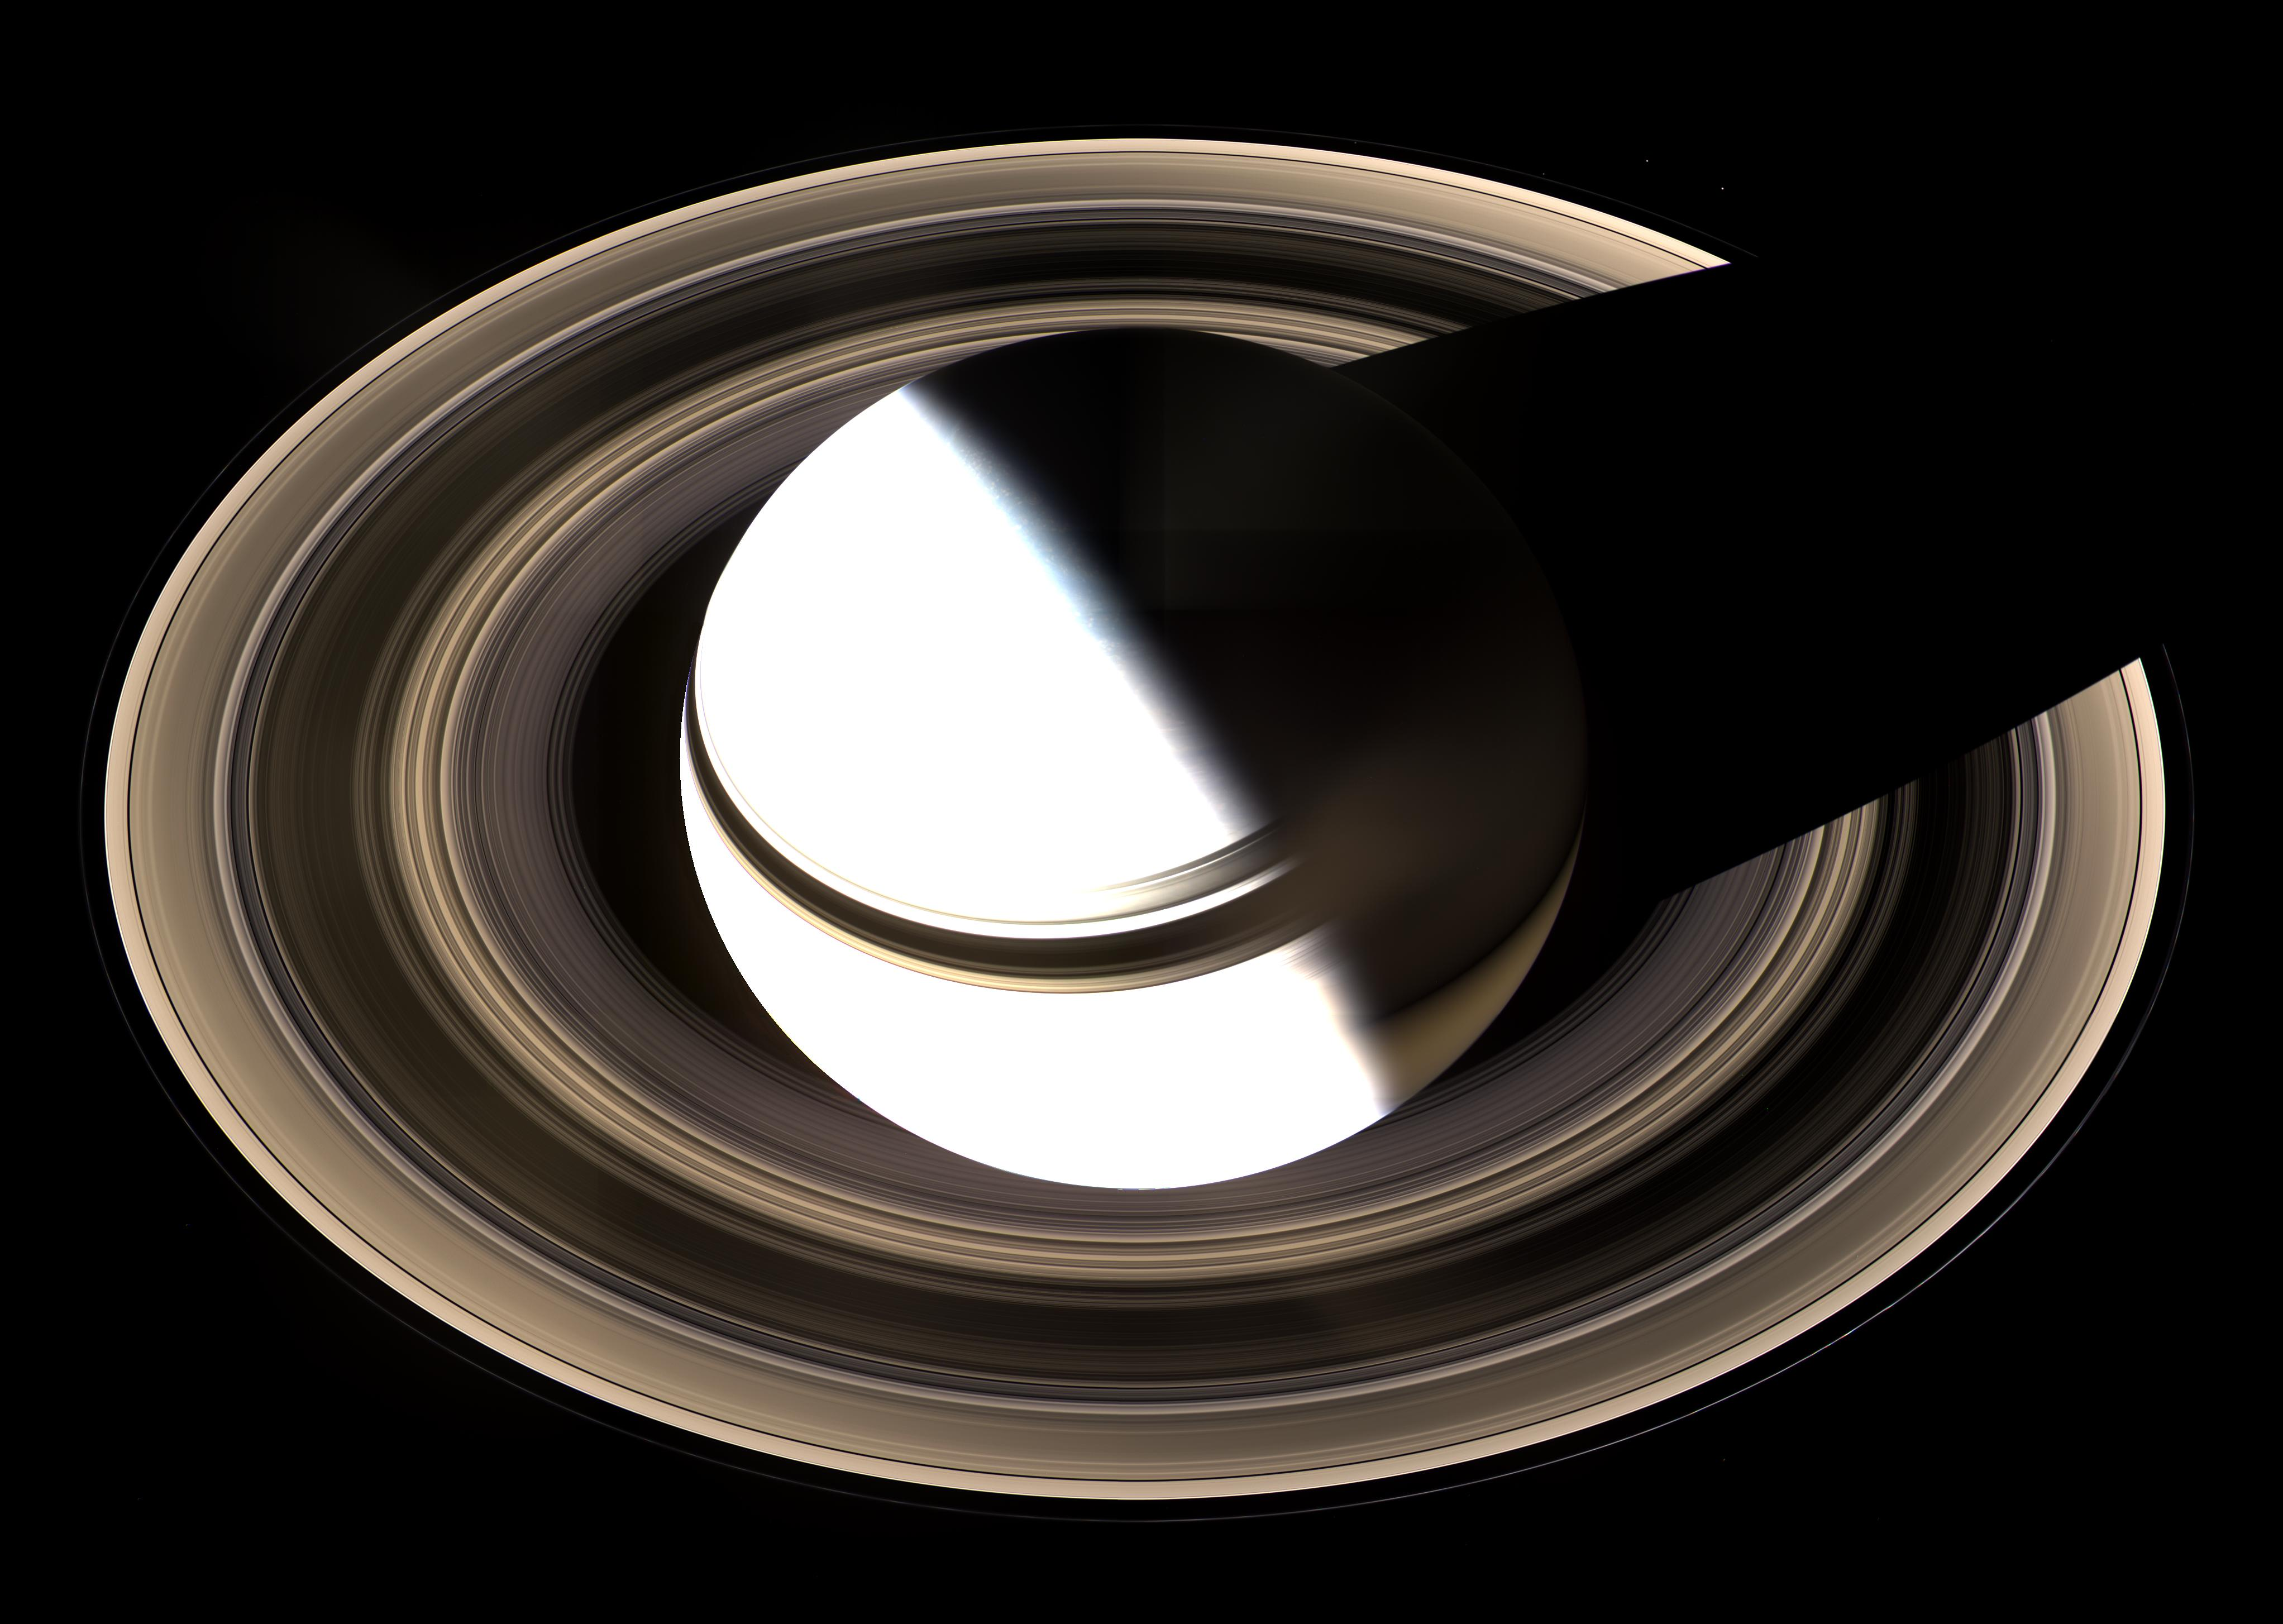 solar system saturn ring - photo #49